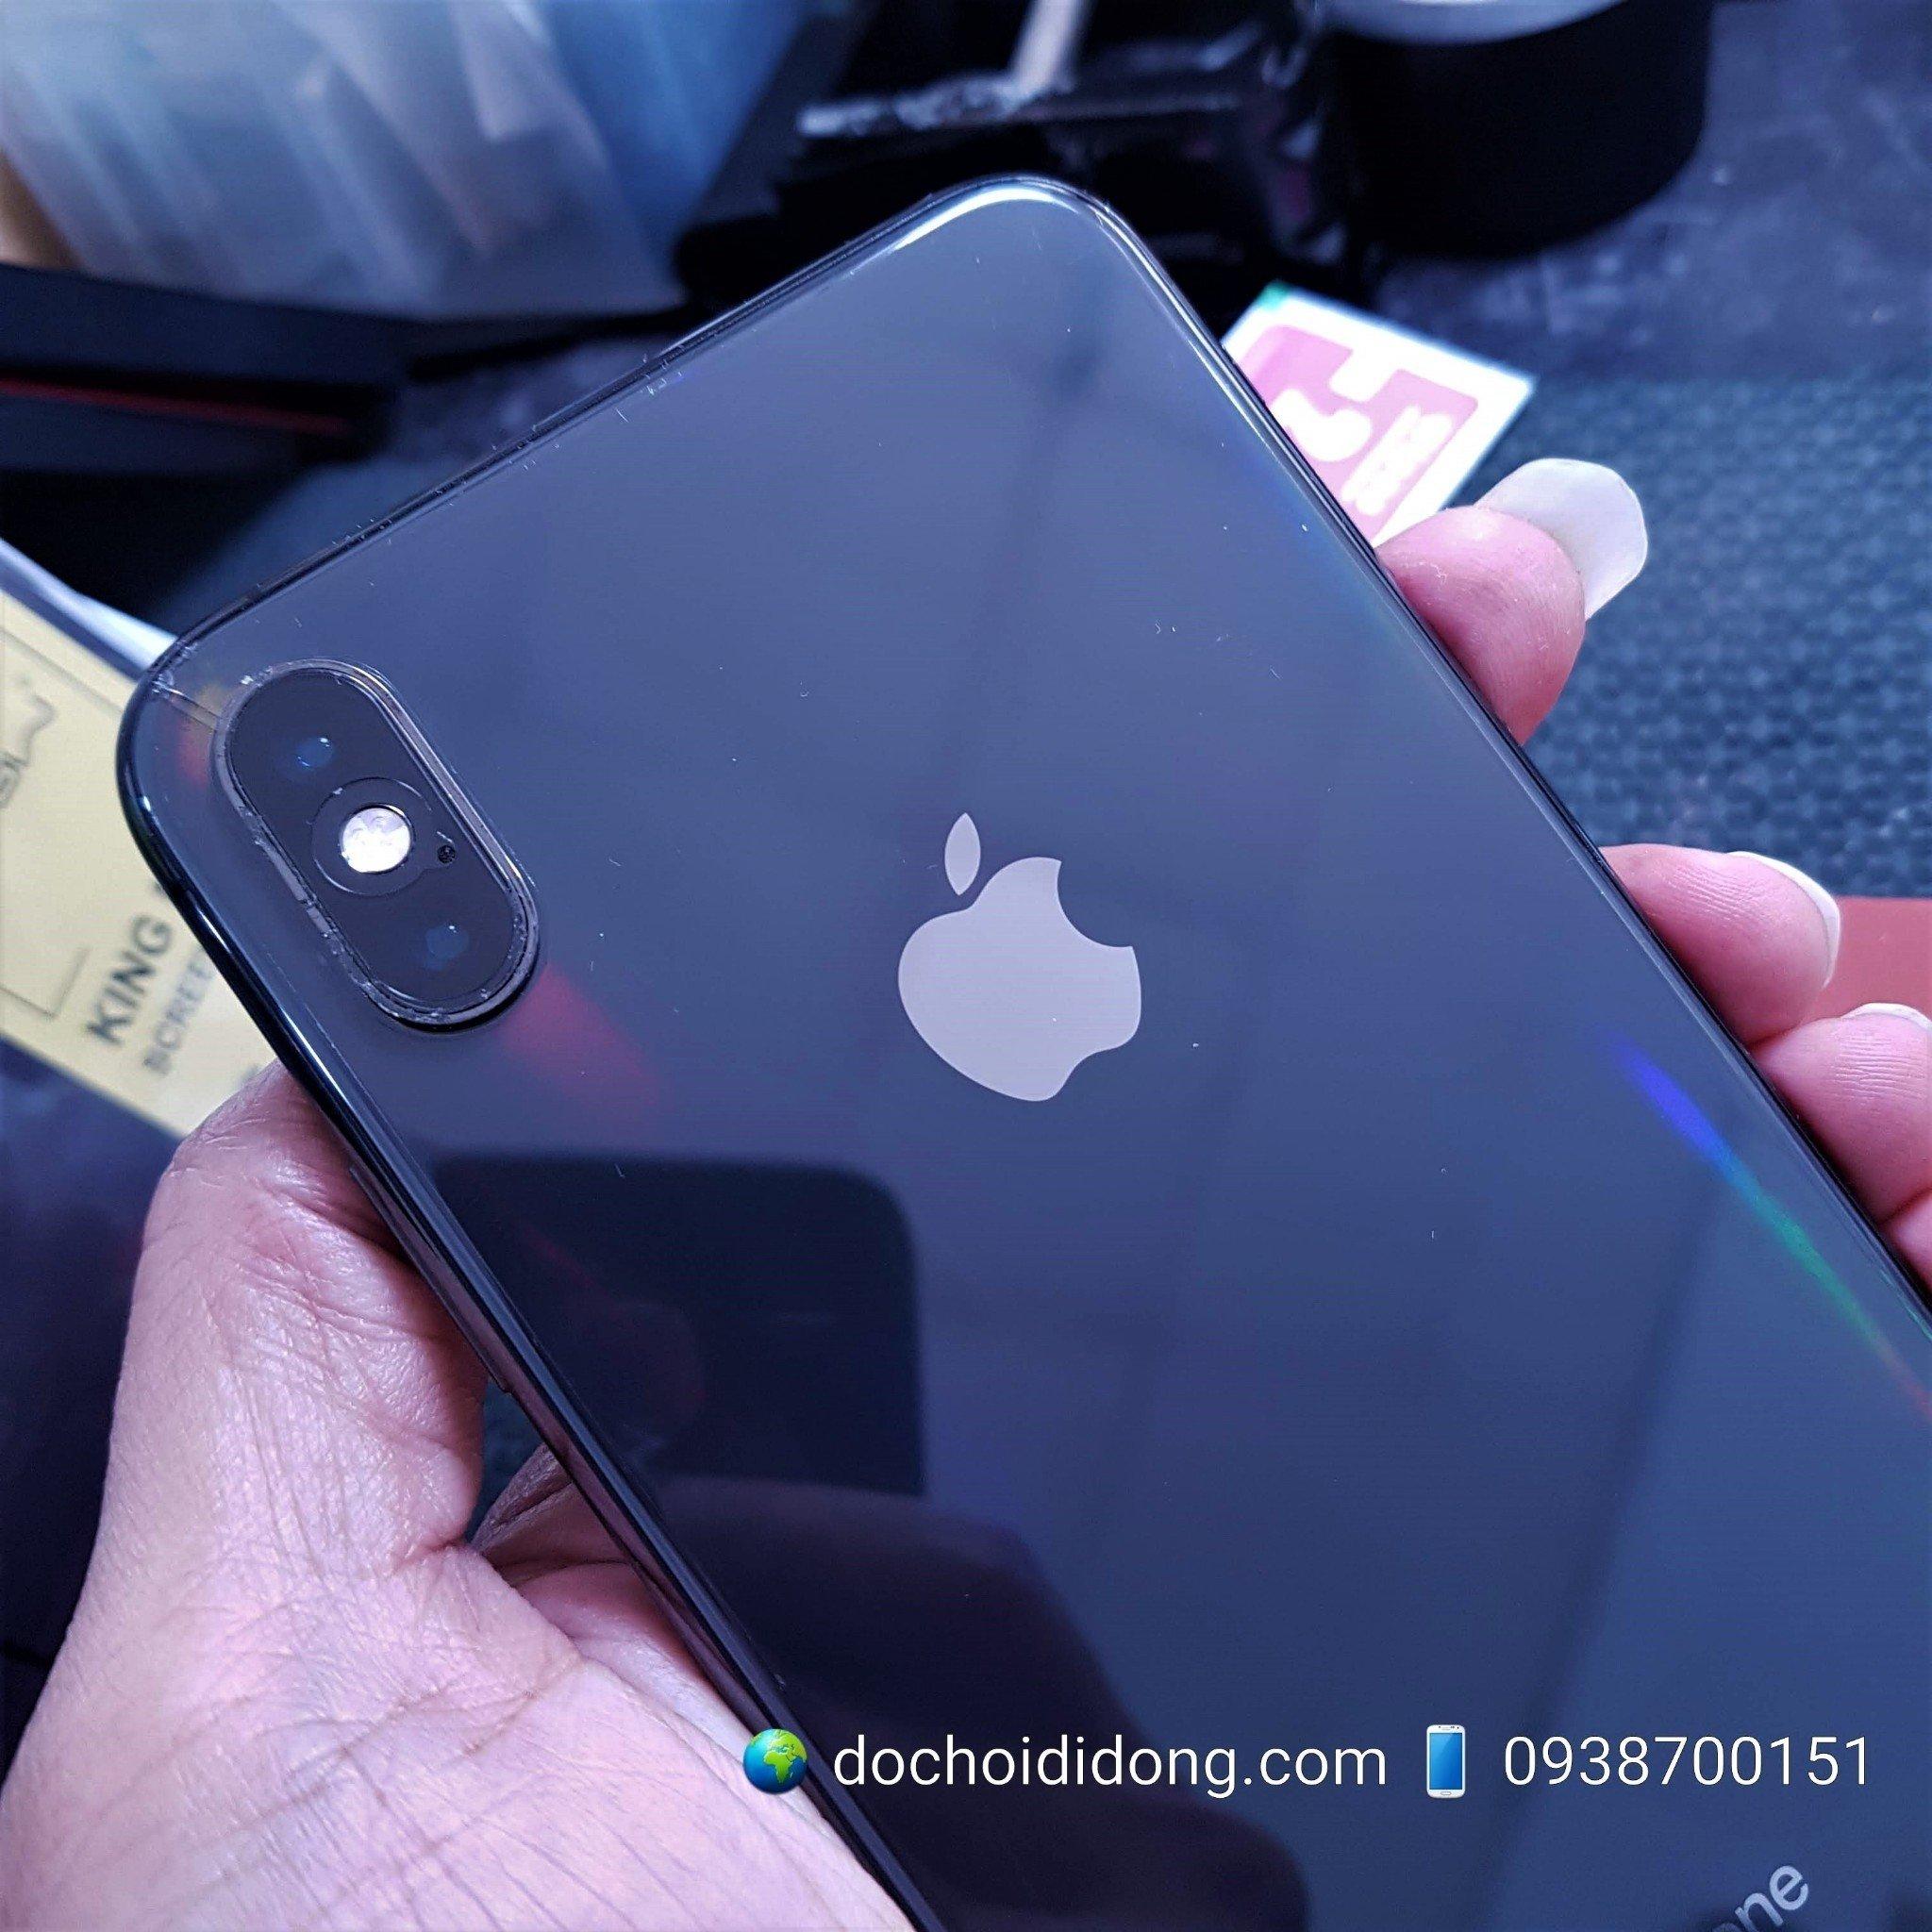 mieng-dan-ppf-rock-iphone-xs-max-trong-nham-doi-mau-cao-cap